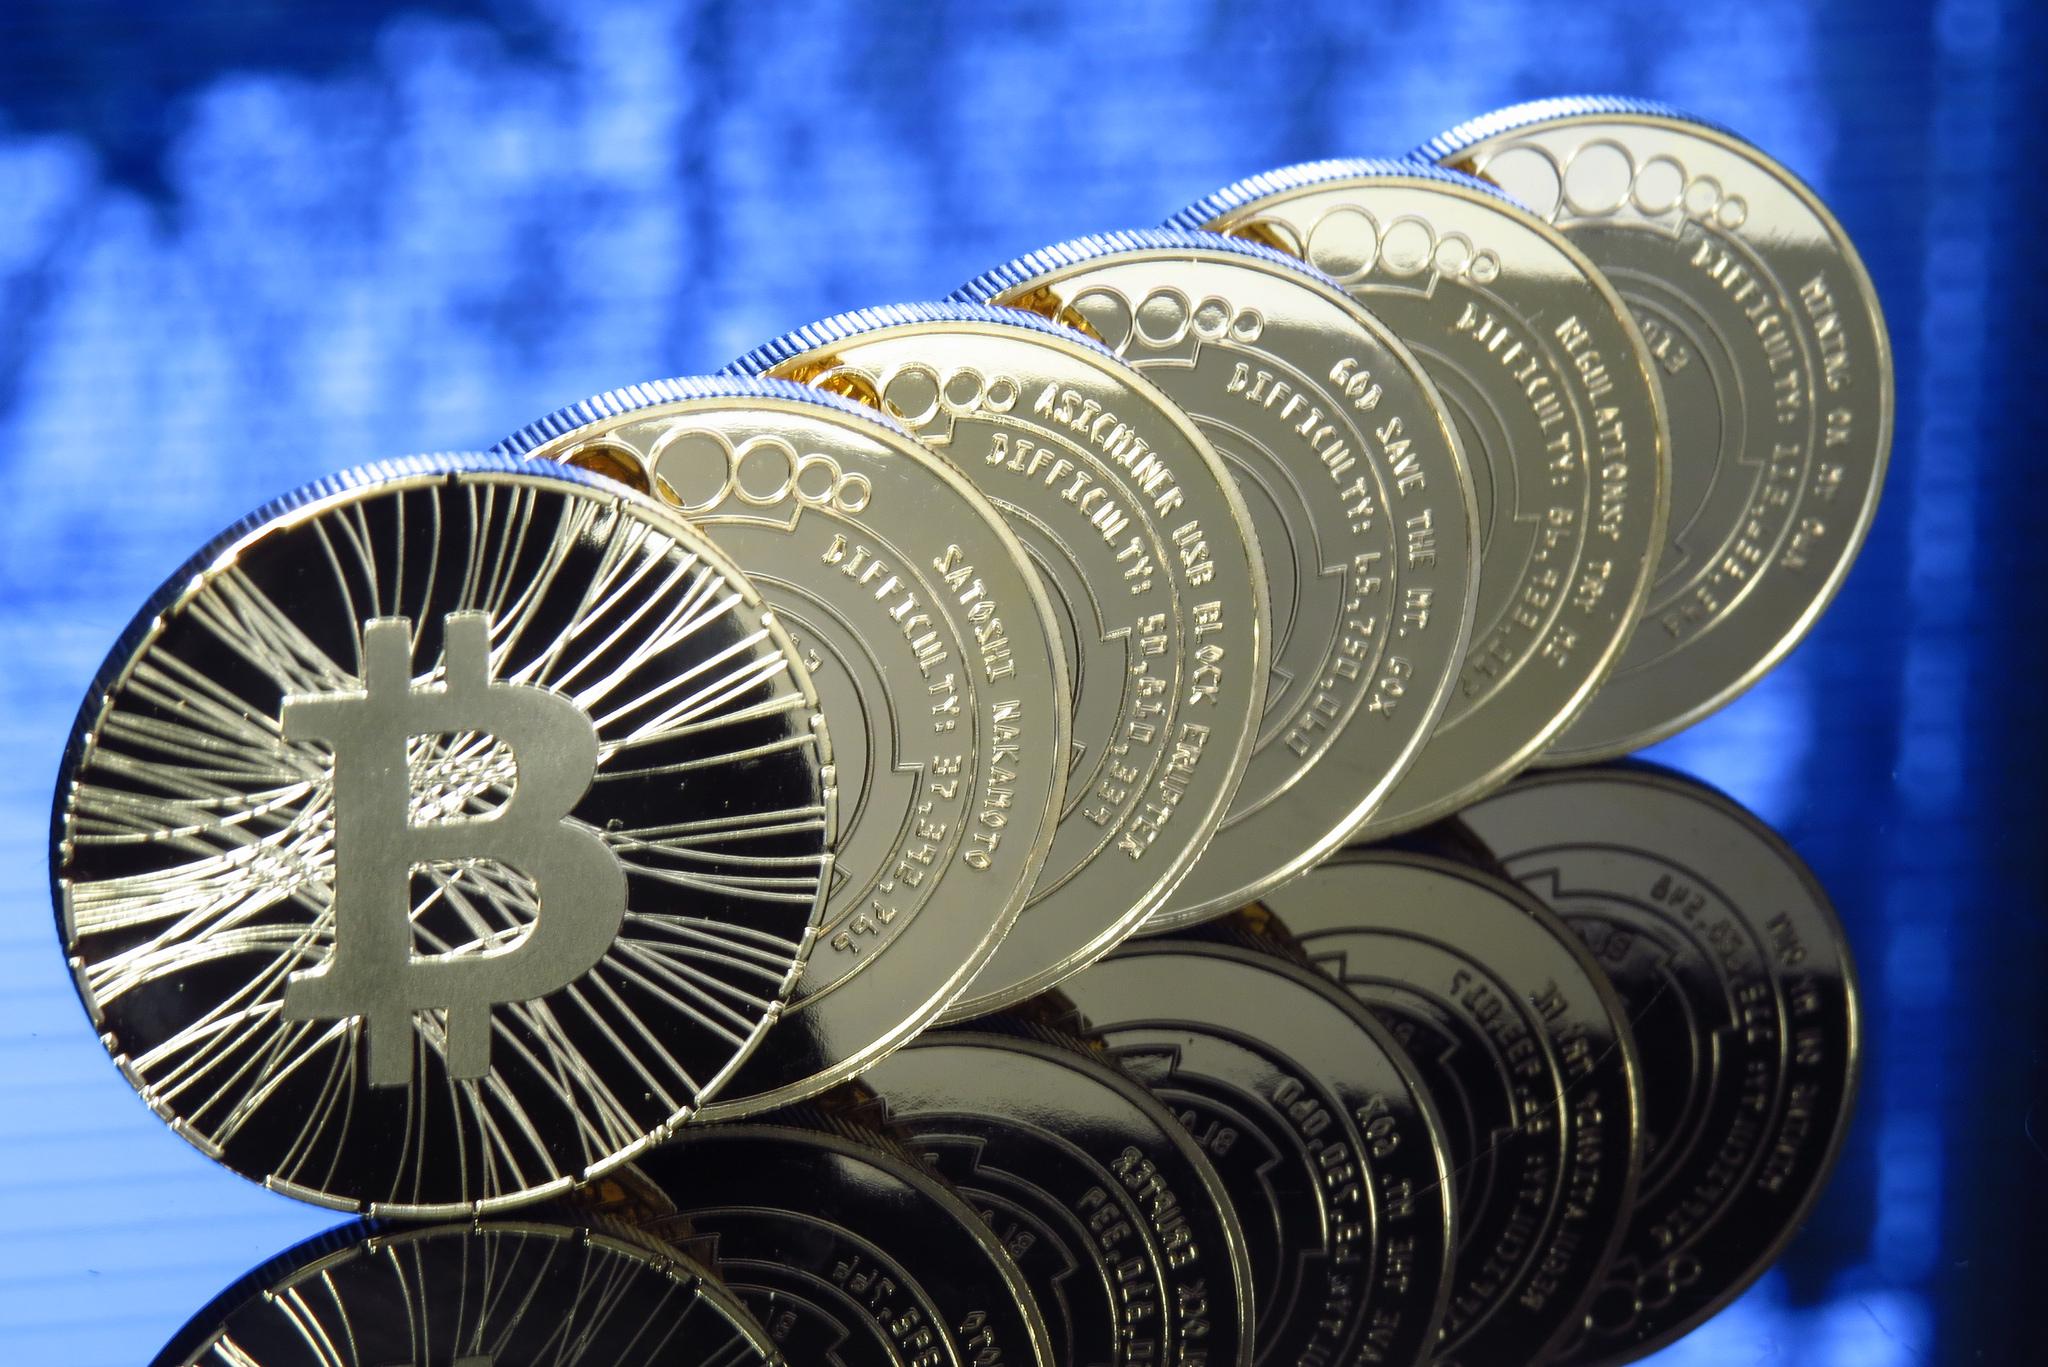 stocks tokenai bitcoin amazon fundstrat